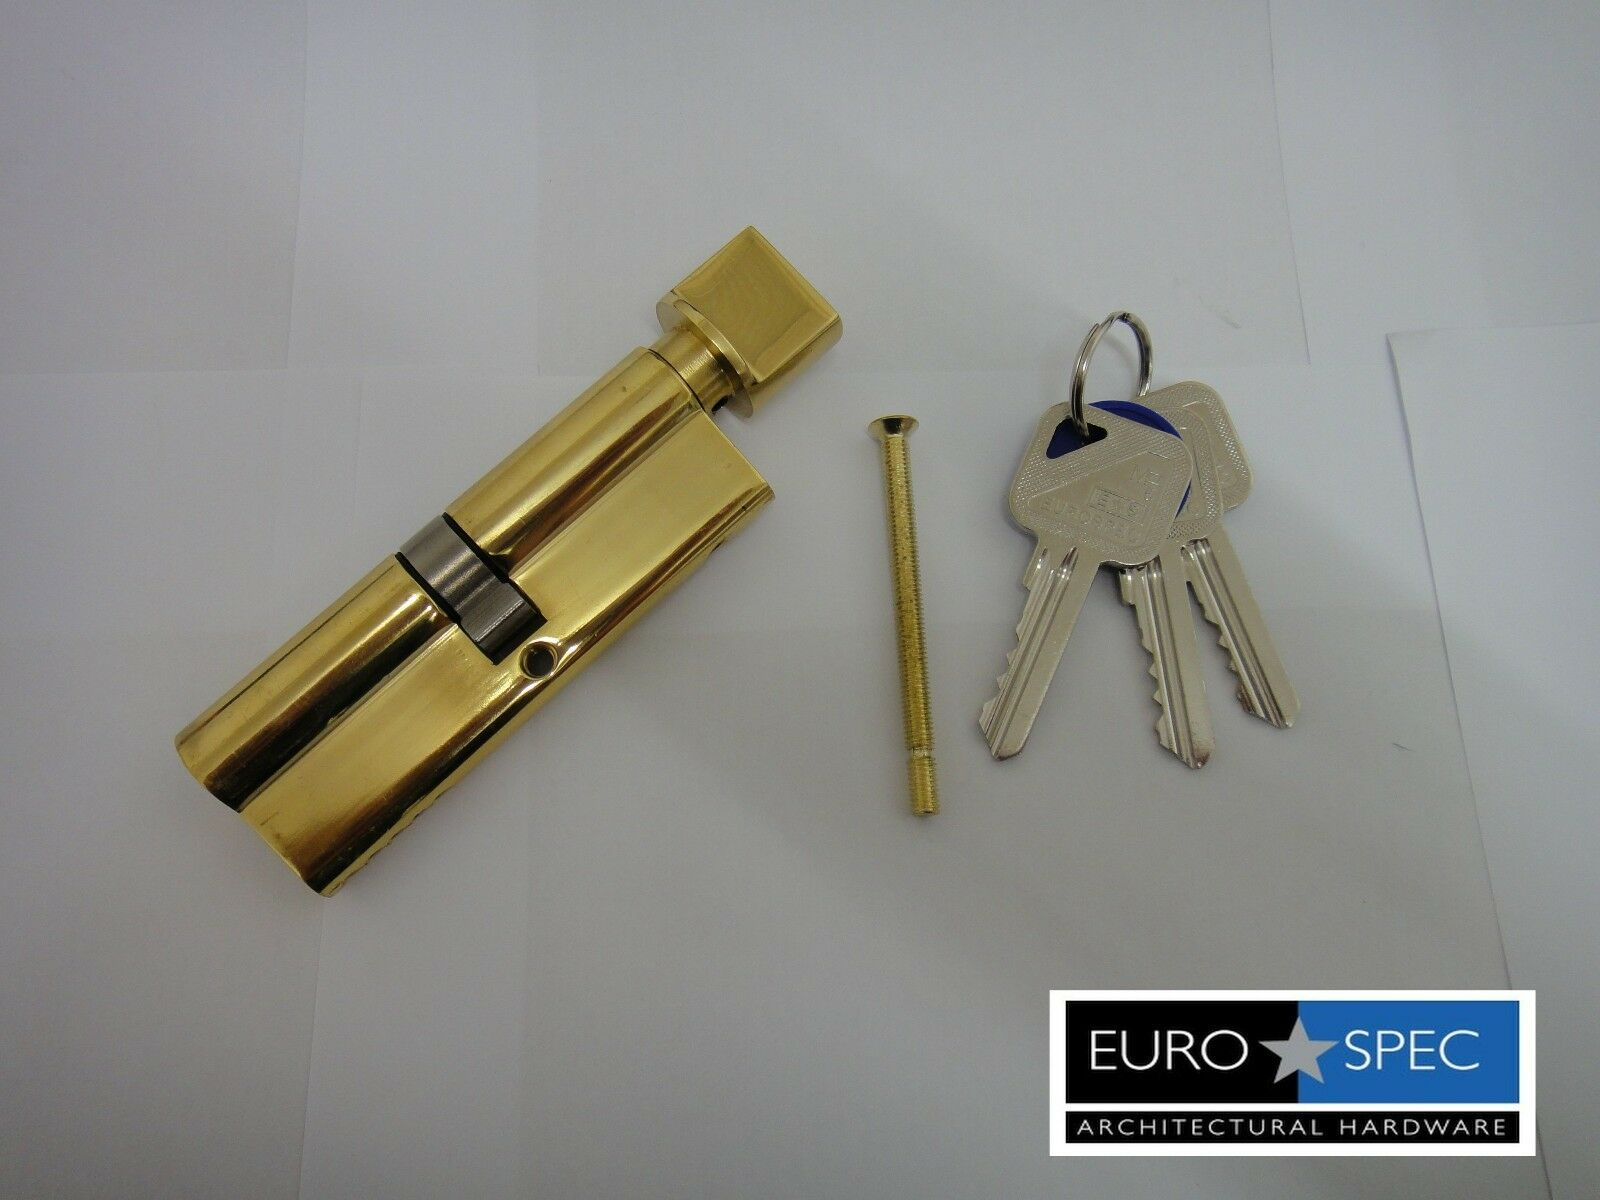 EuroSpec MP5 Euro Thumbturn Cylinder 45/45mm (90 mm) 5PIN laiton poli-Neuf poli-Neuf laiton d9abb3